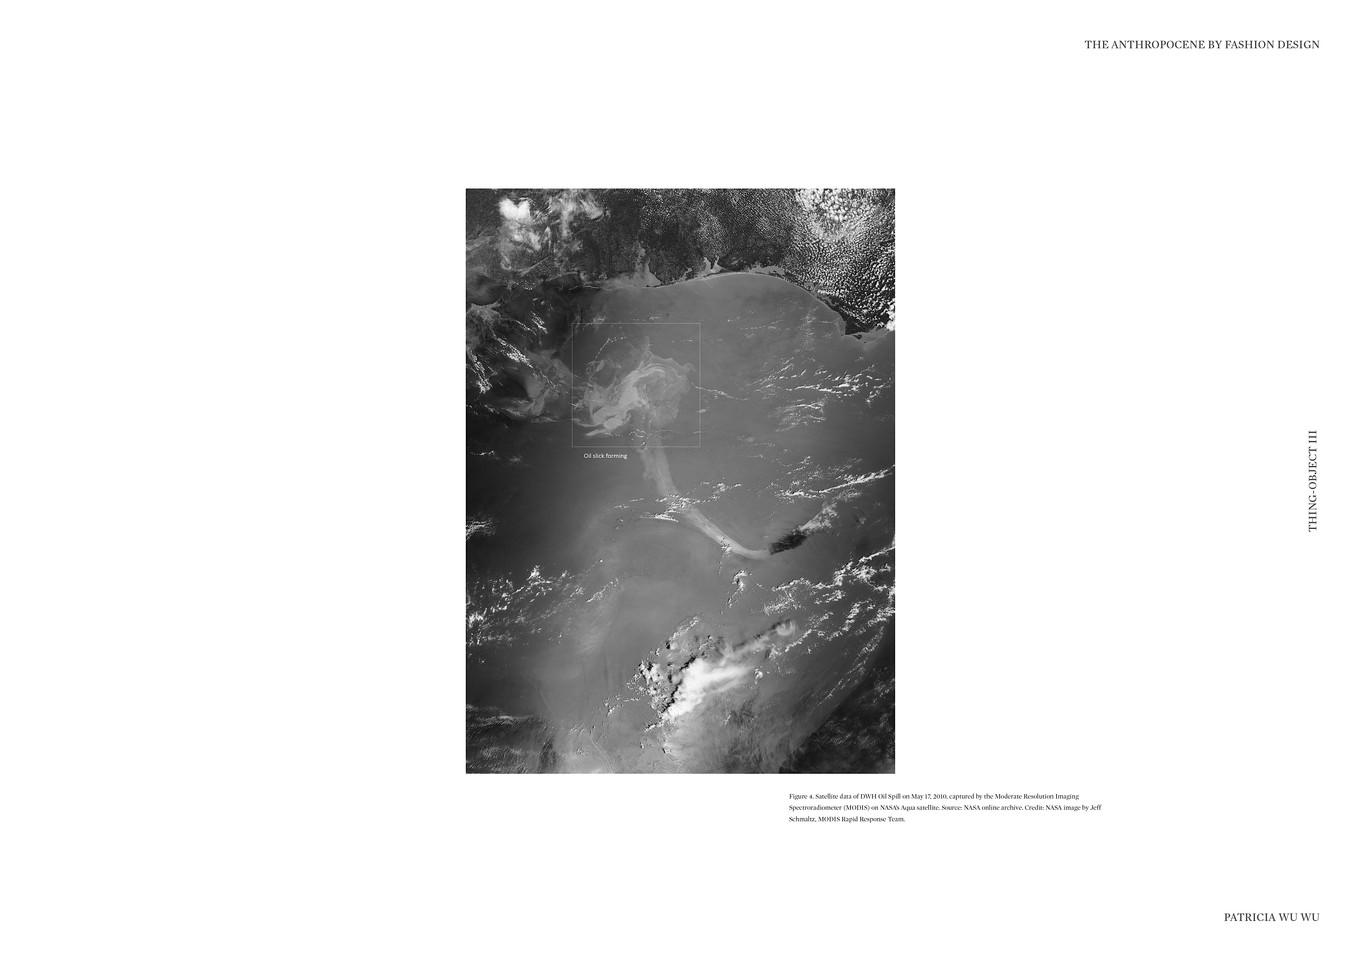 Thing-Object III _portfolio + text 337-3495.jpg